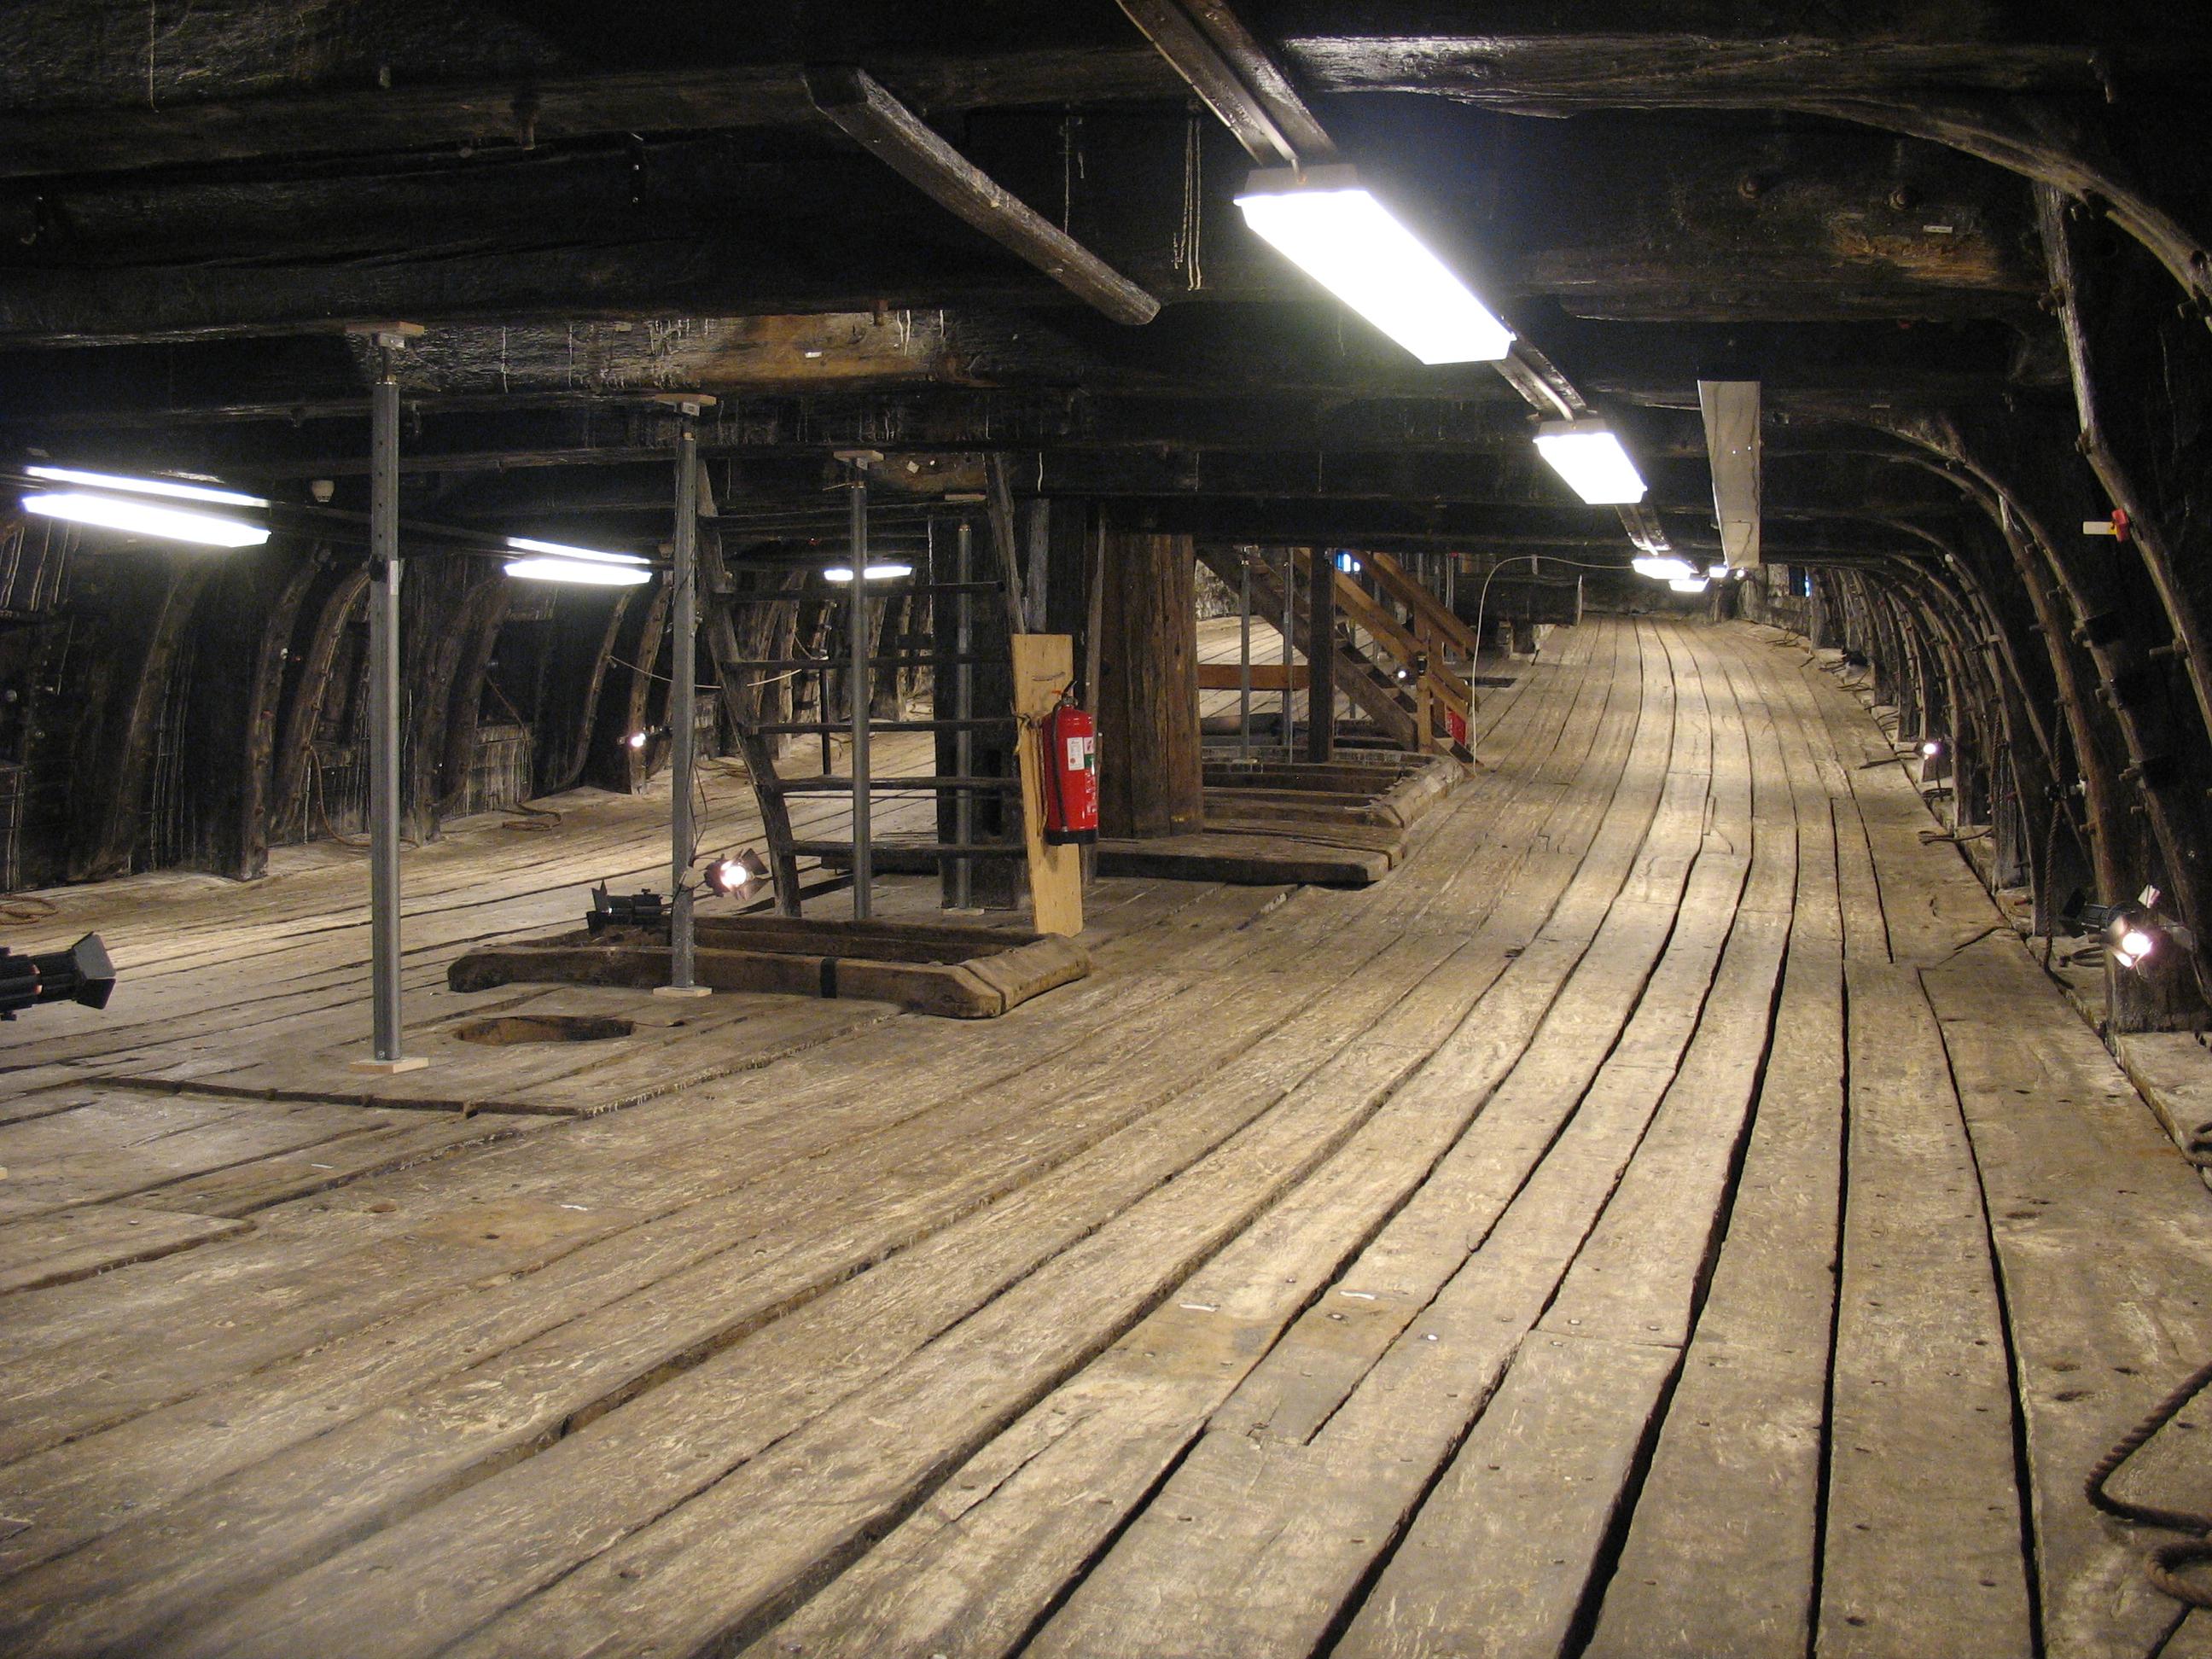 File:Vasa-lower gun deck-2.jpg - Wikimedia Commons